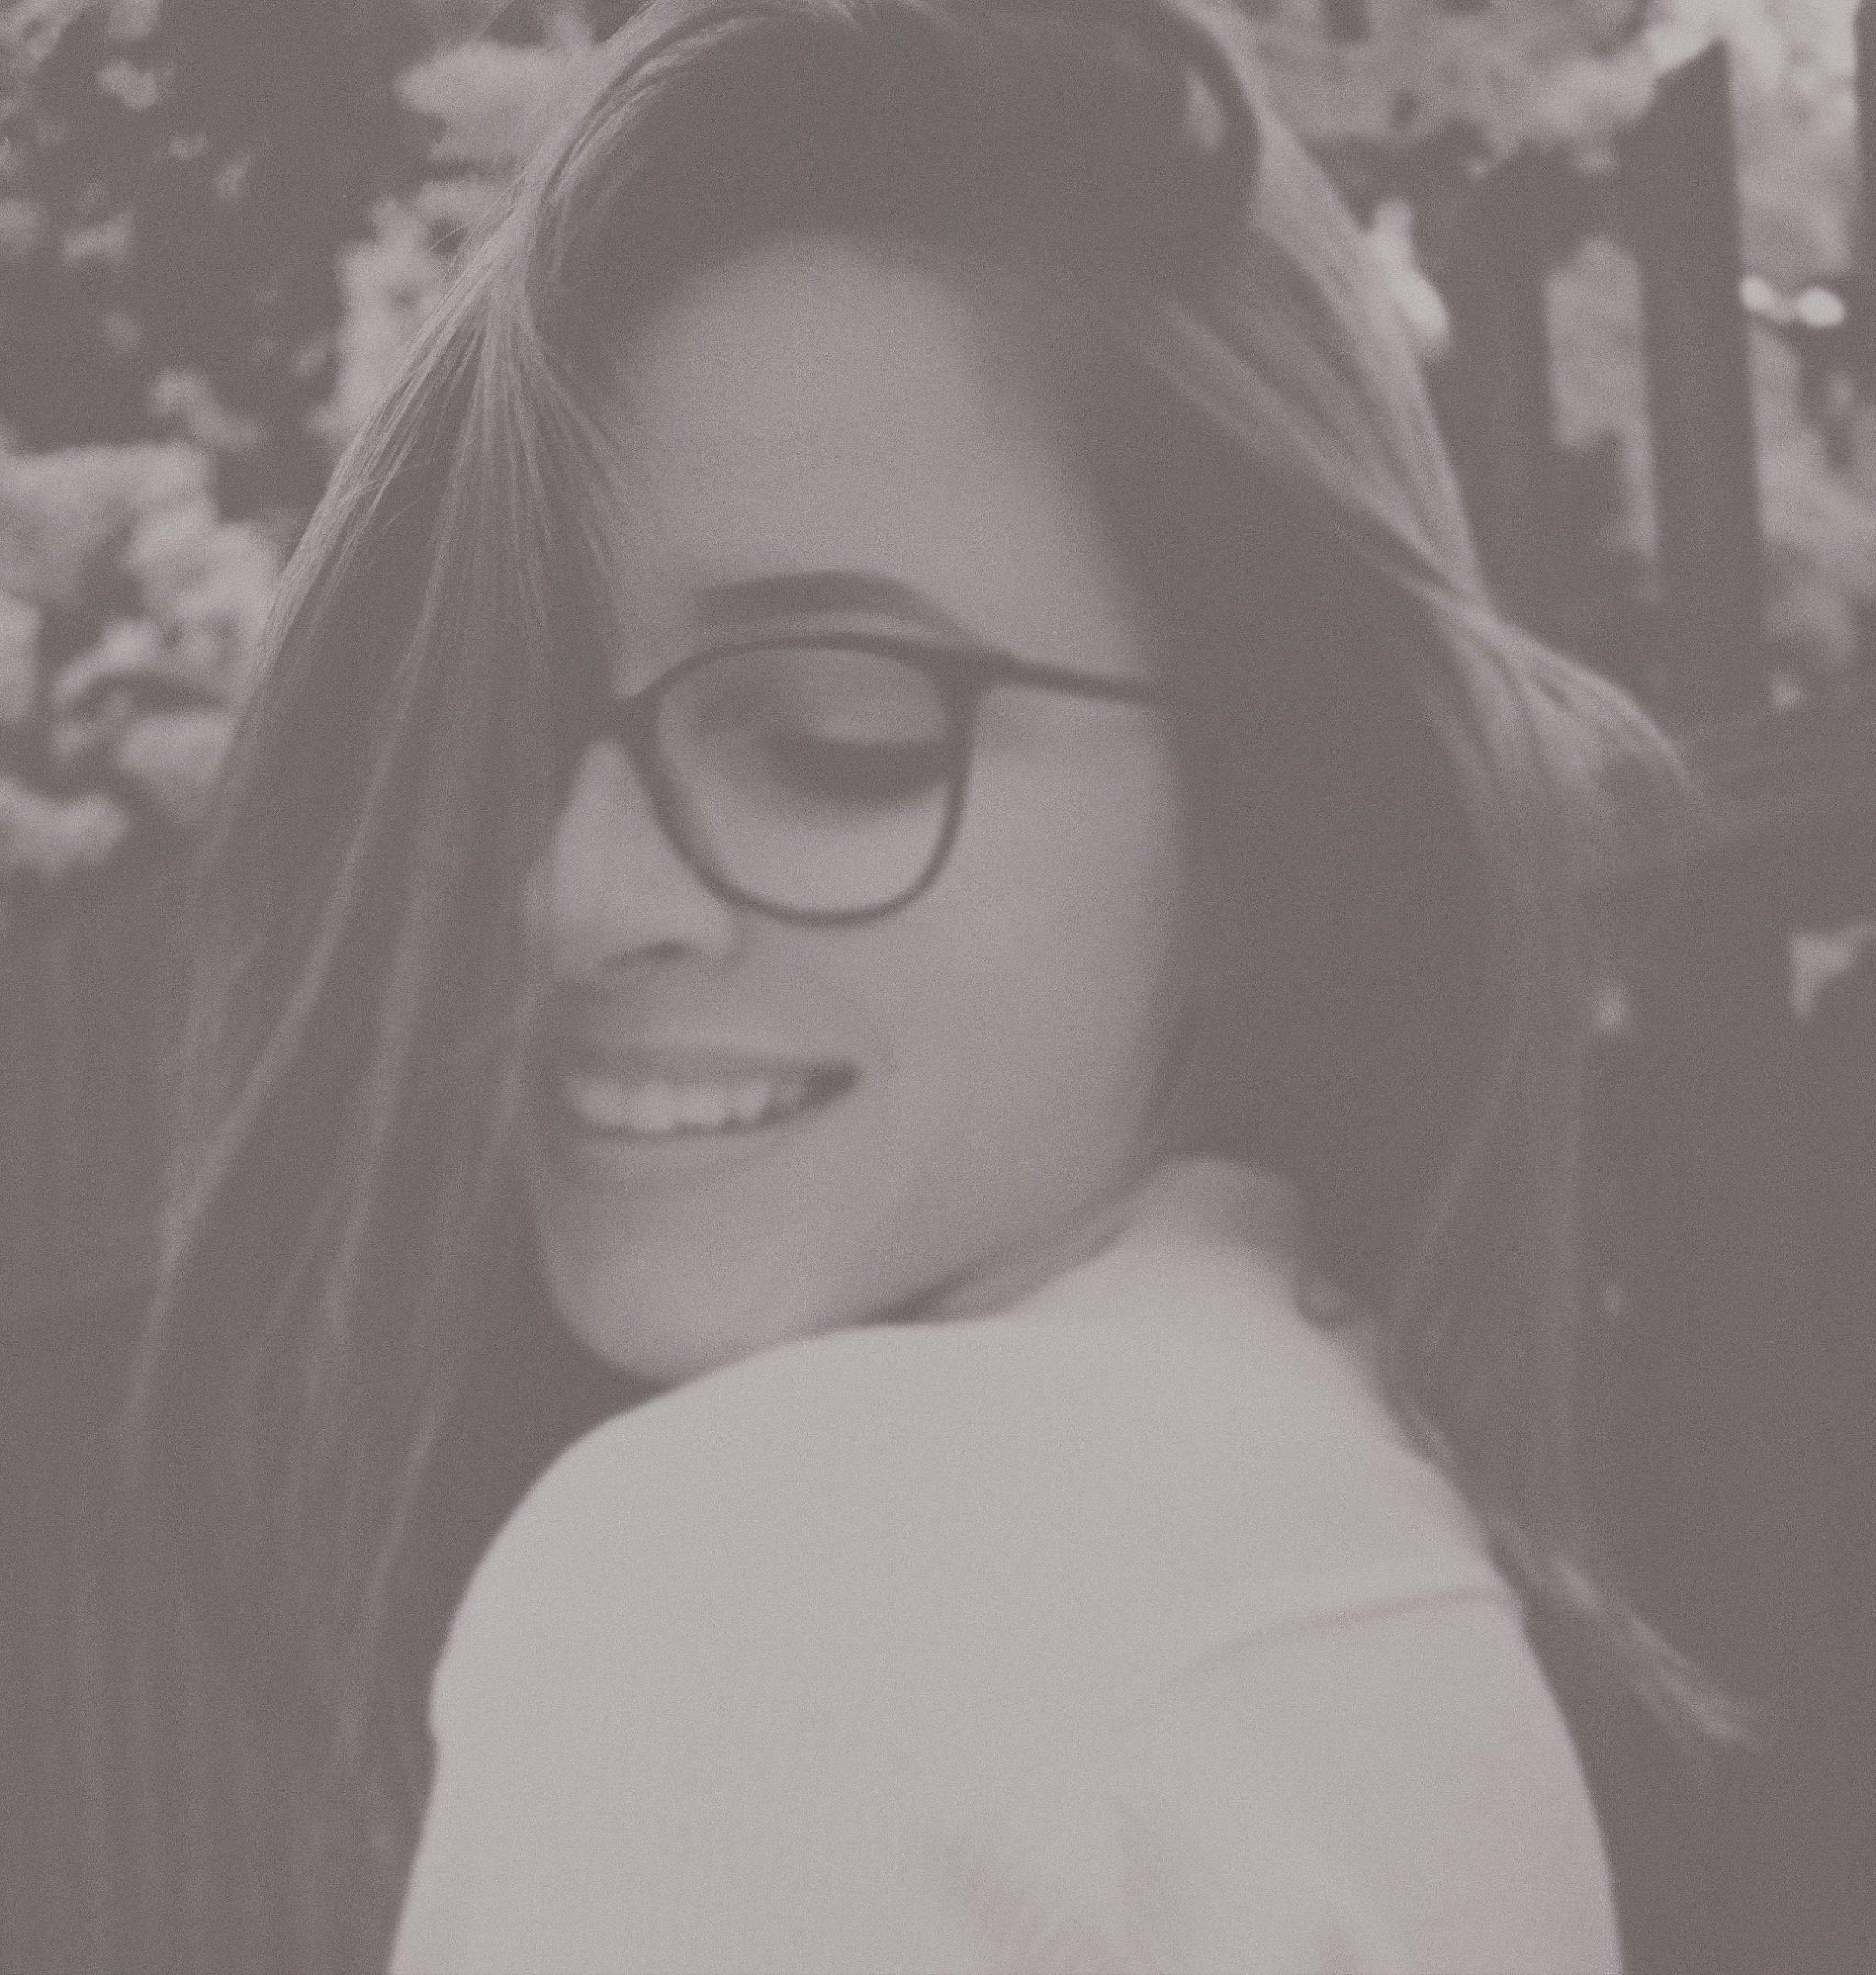 Lena Hemsworth